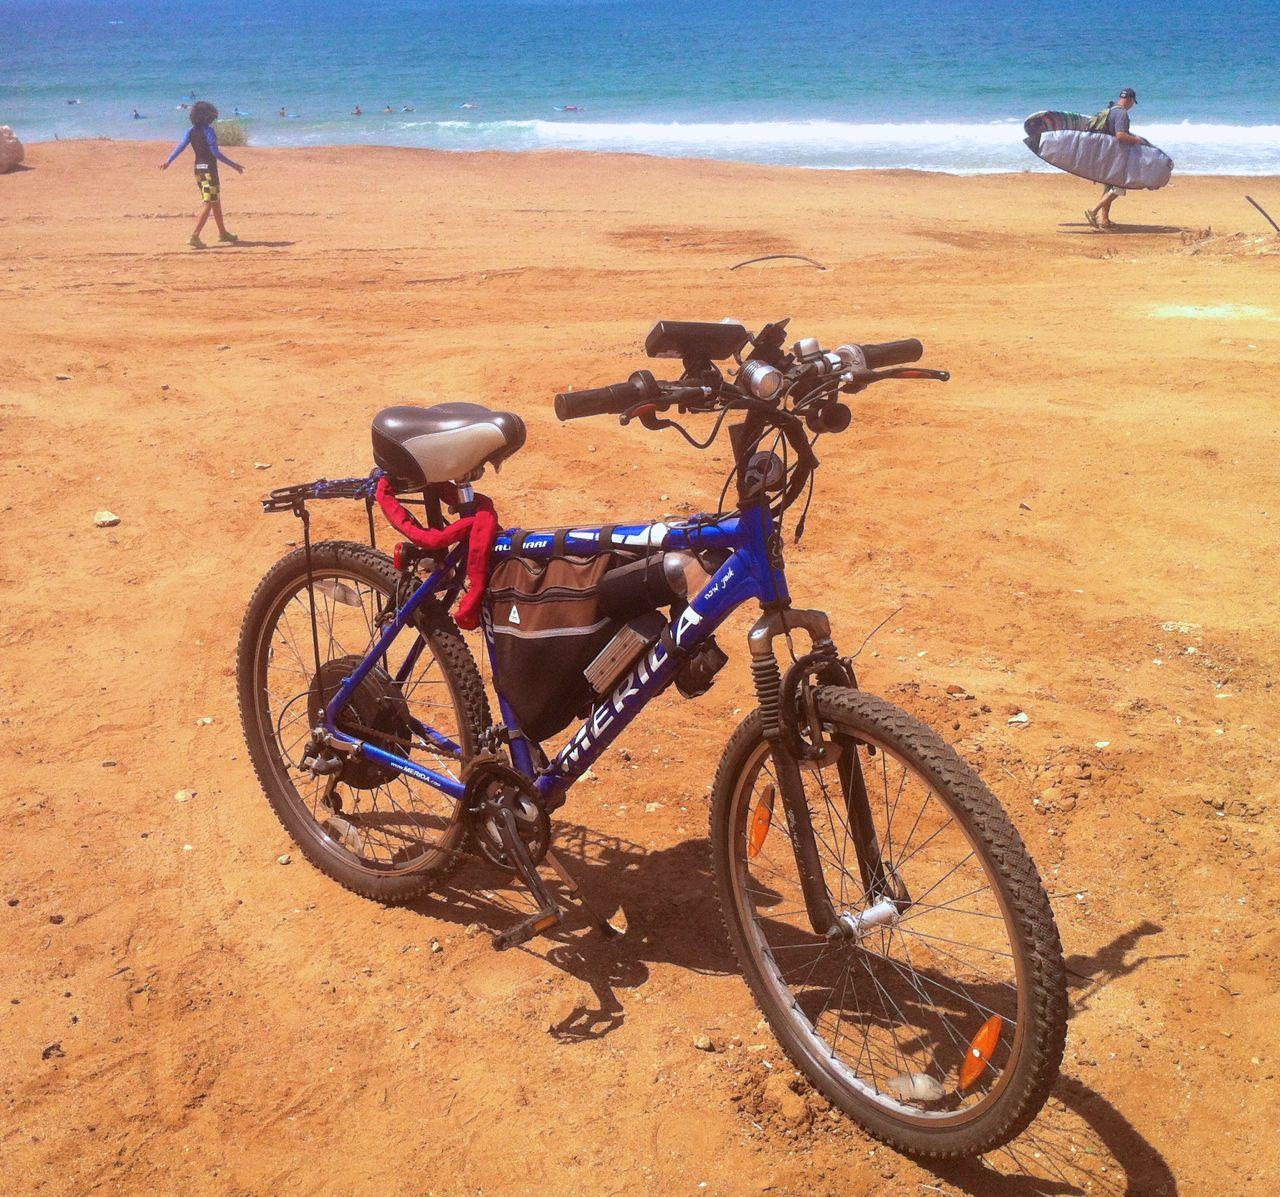 micahs bike